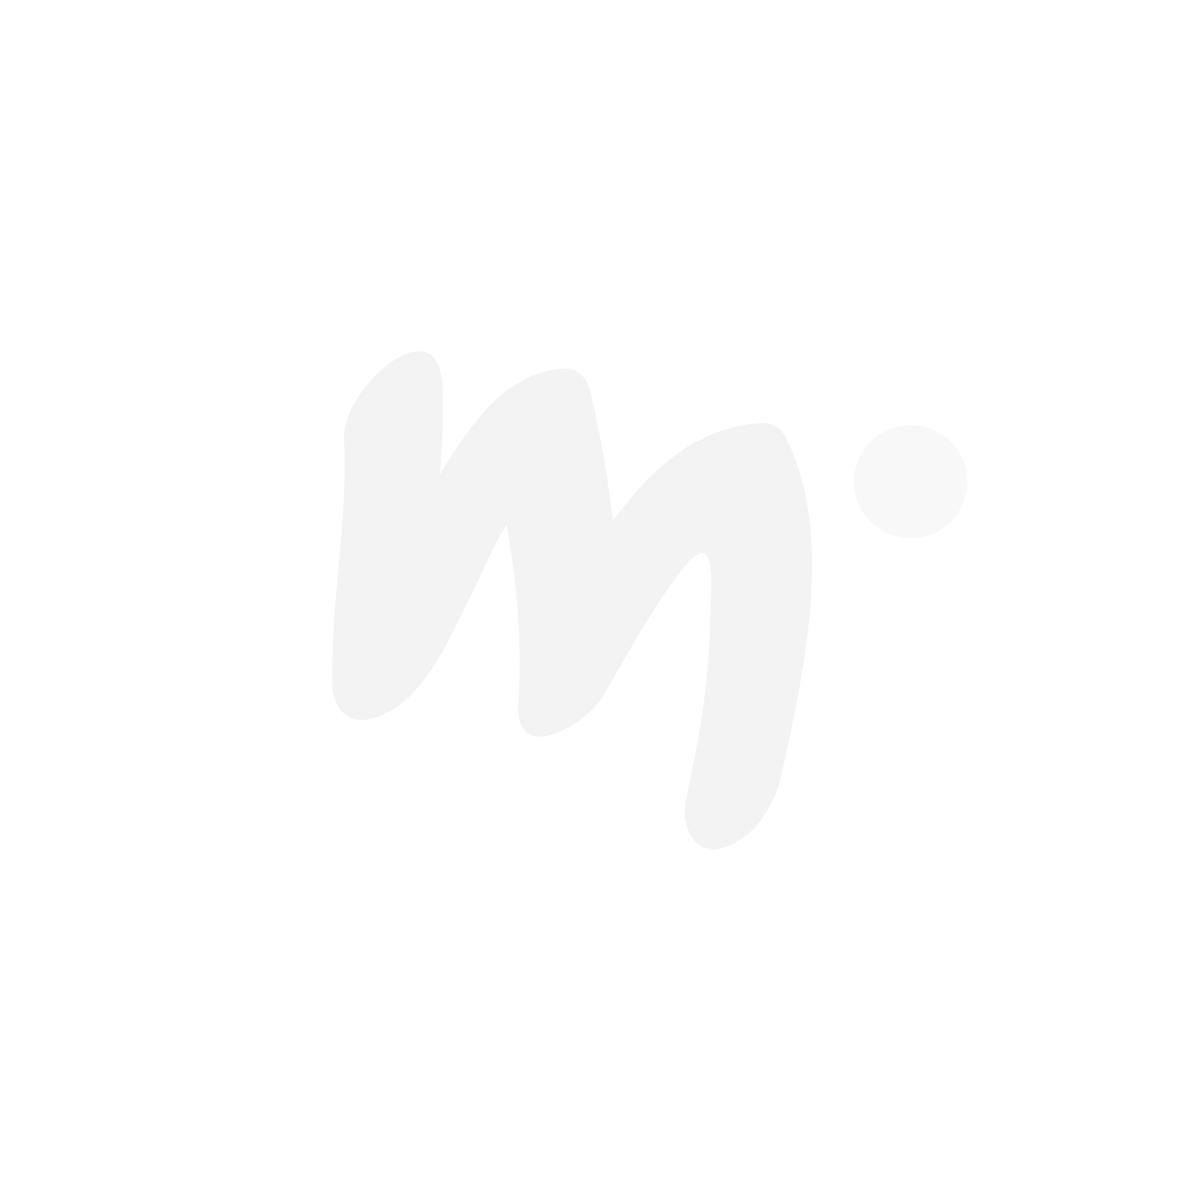 Peppi Pitkätossu Kekkeri-mekko mintunvihreä